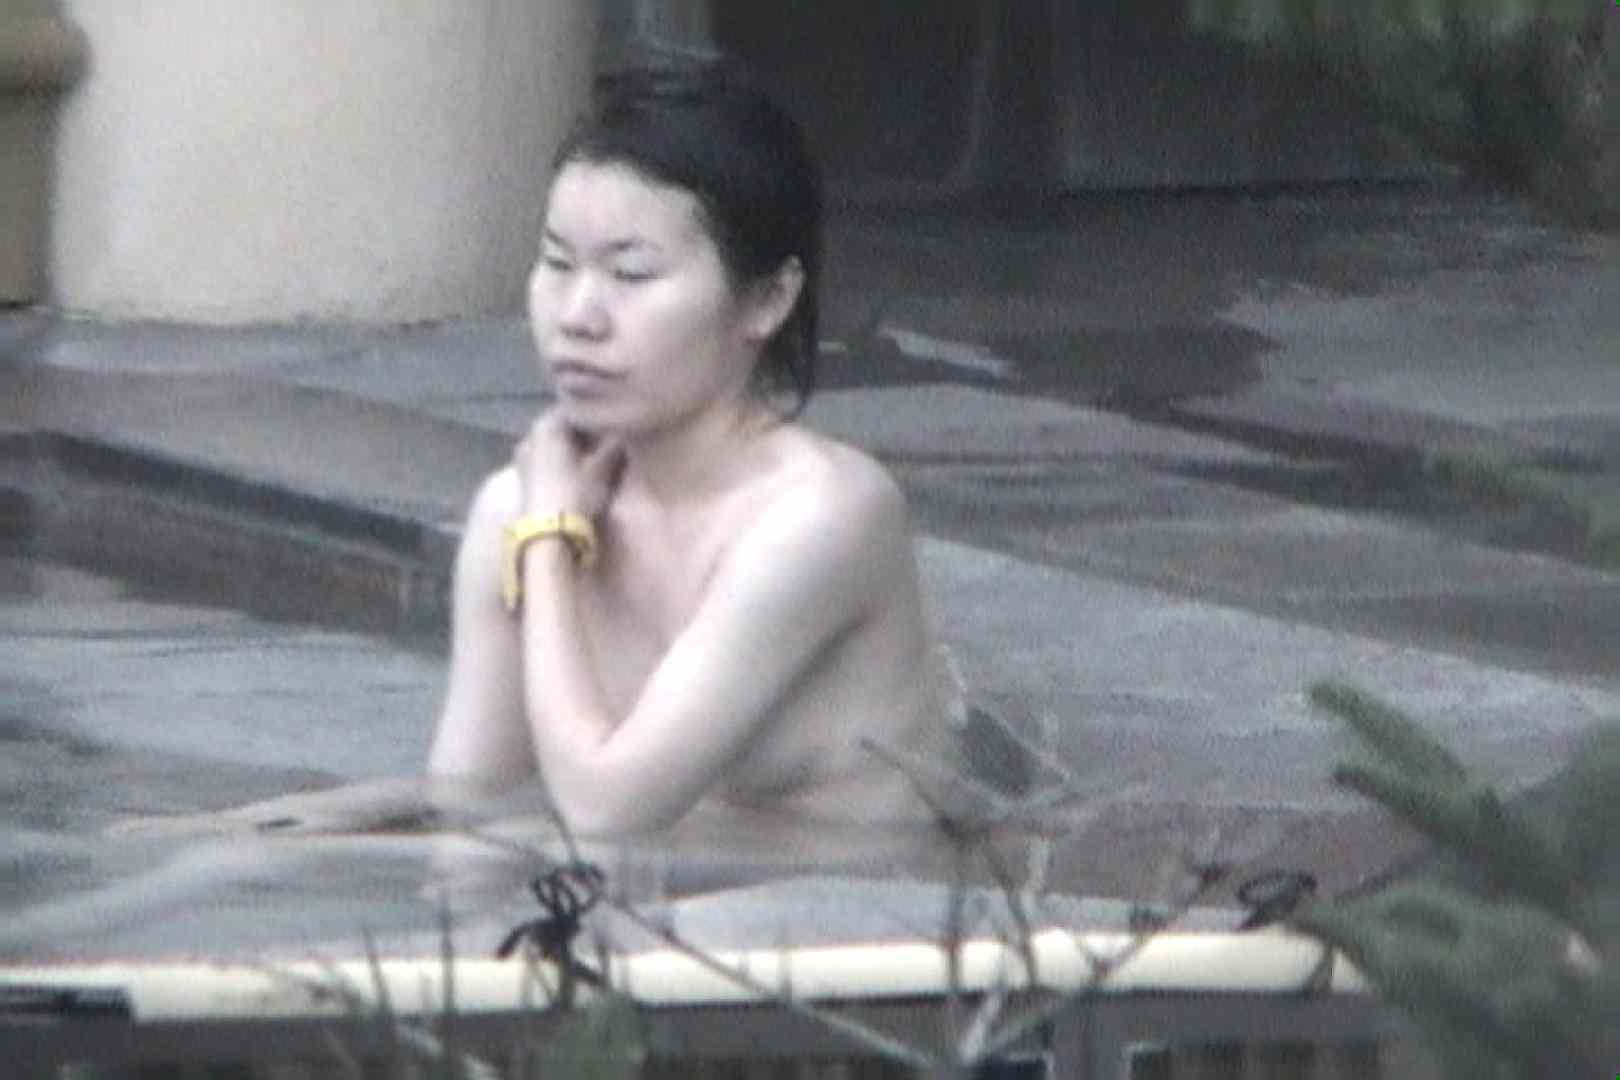 Aquaな露天風呂Vol.556 露天風呂編 | 盗撮シリーズ  99PIX 51